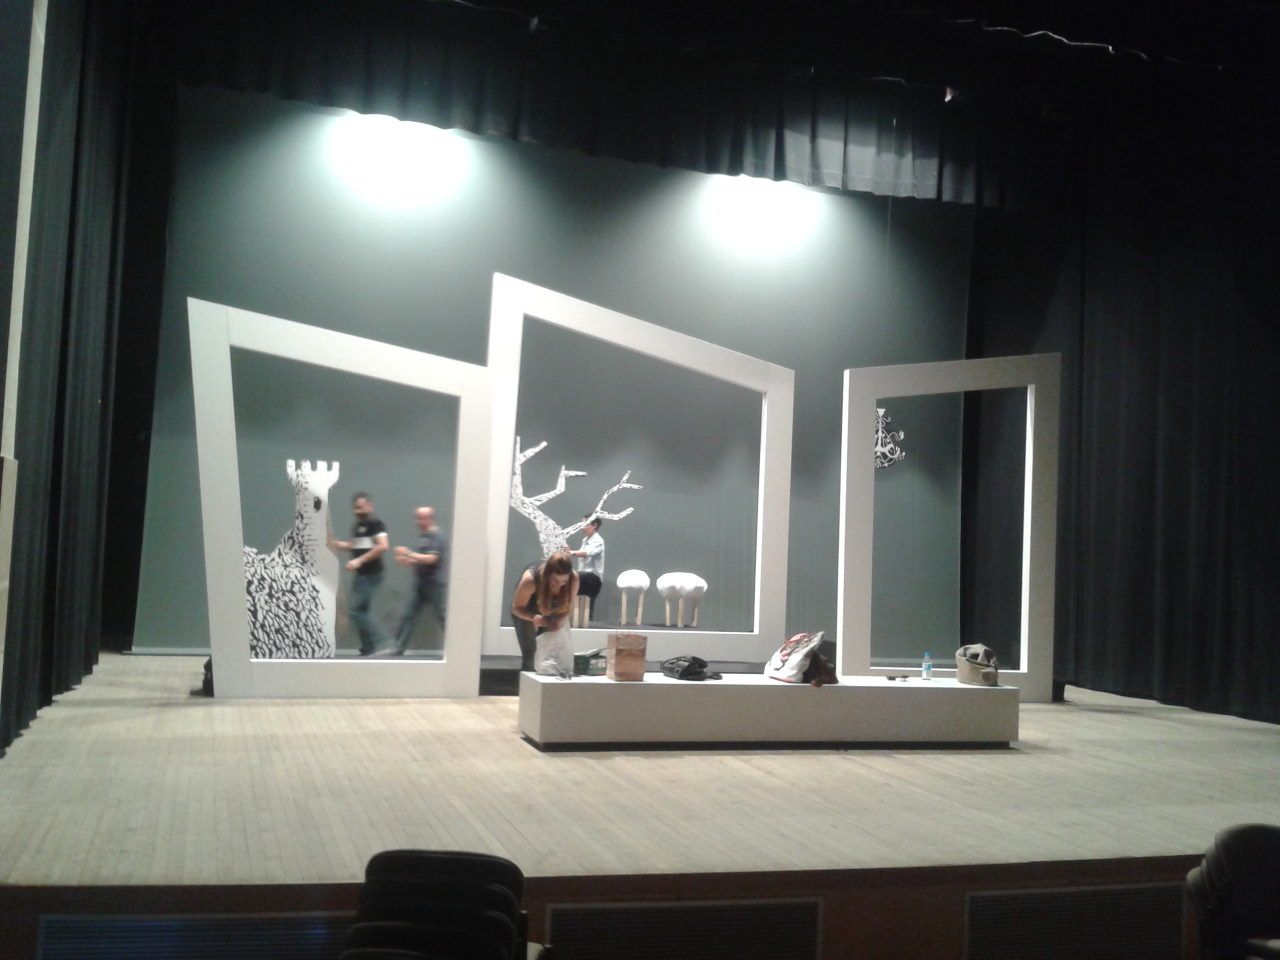 Easdalcoy Interiorismo Realiza La Escenograf A De La Opera